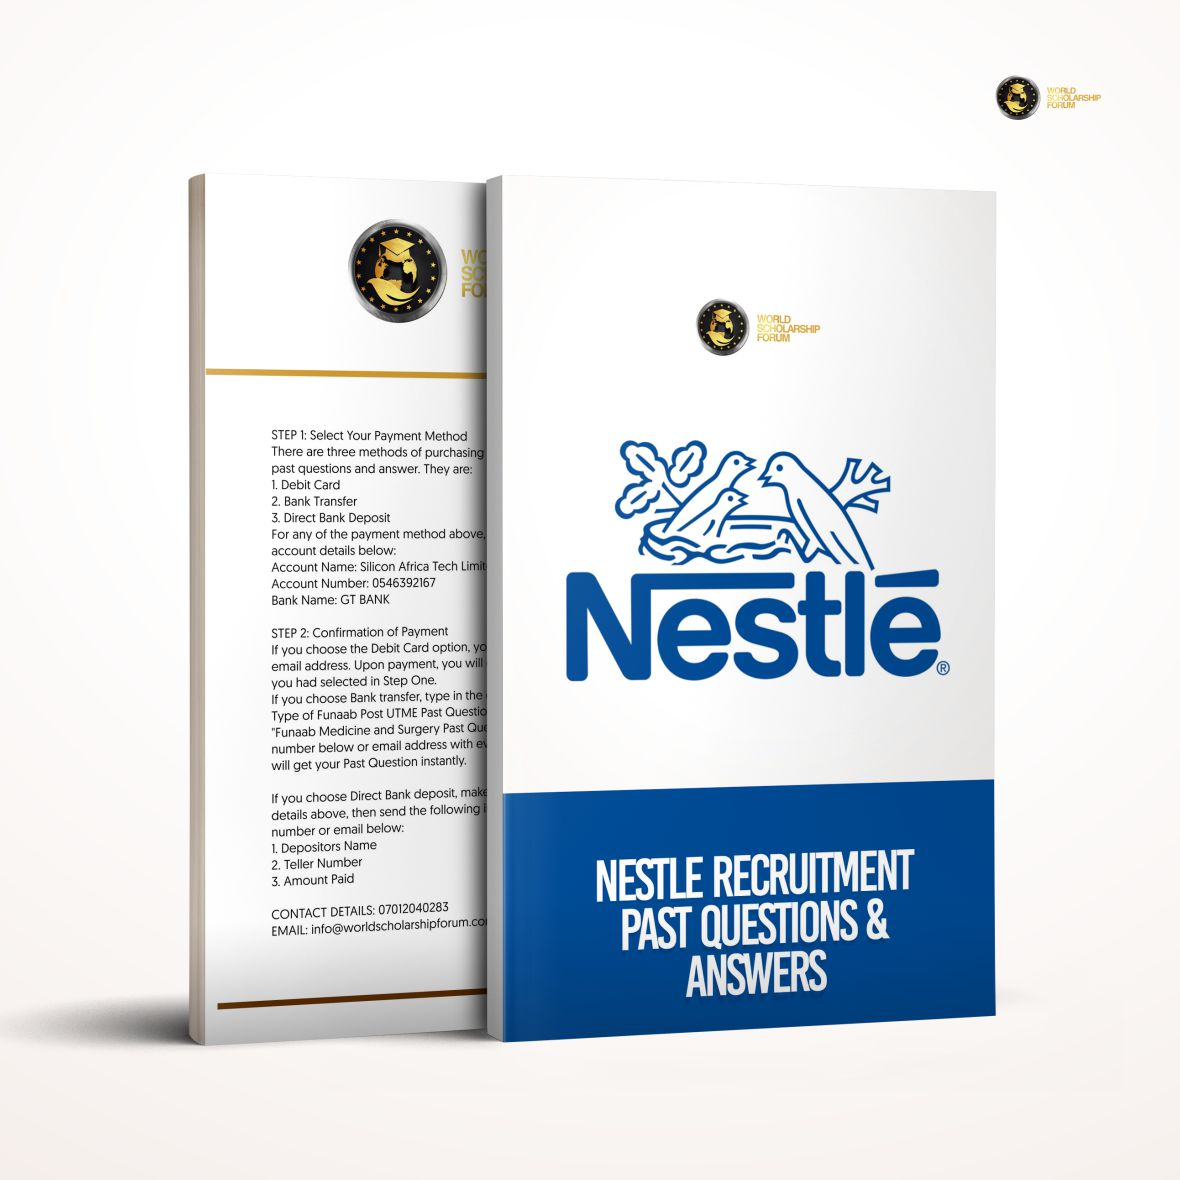 nestle-past-questions-answers-pdf